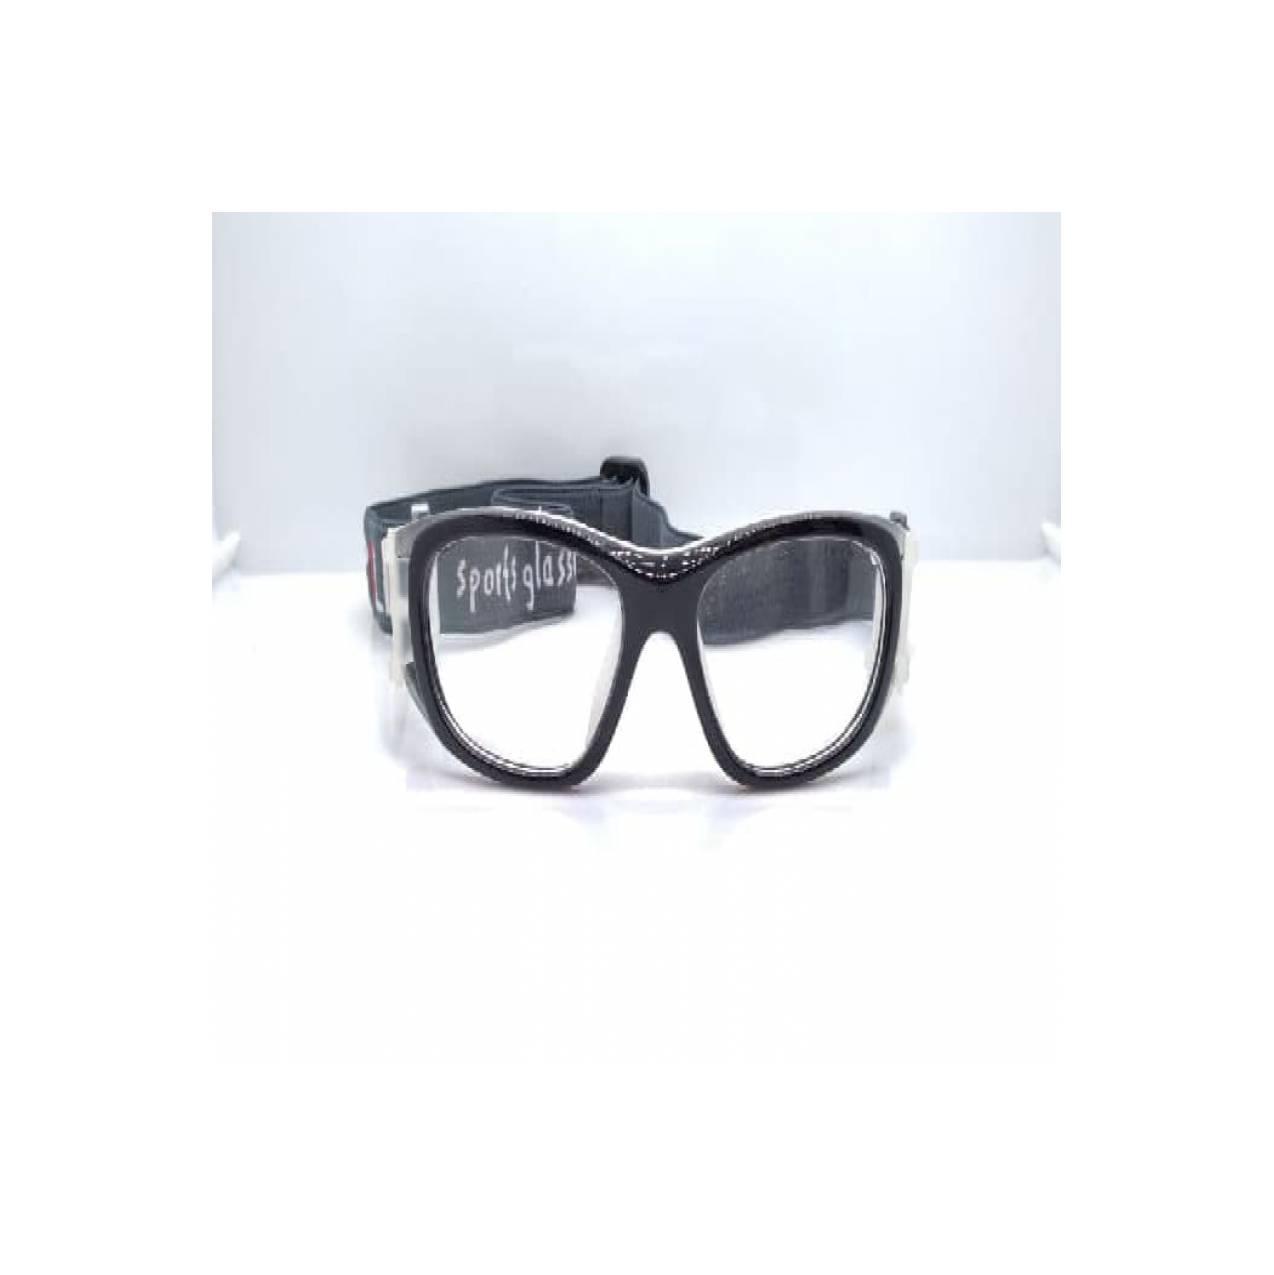 kacamata sport basket futsal olahraga dll include lensa minus